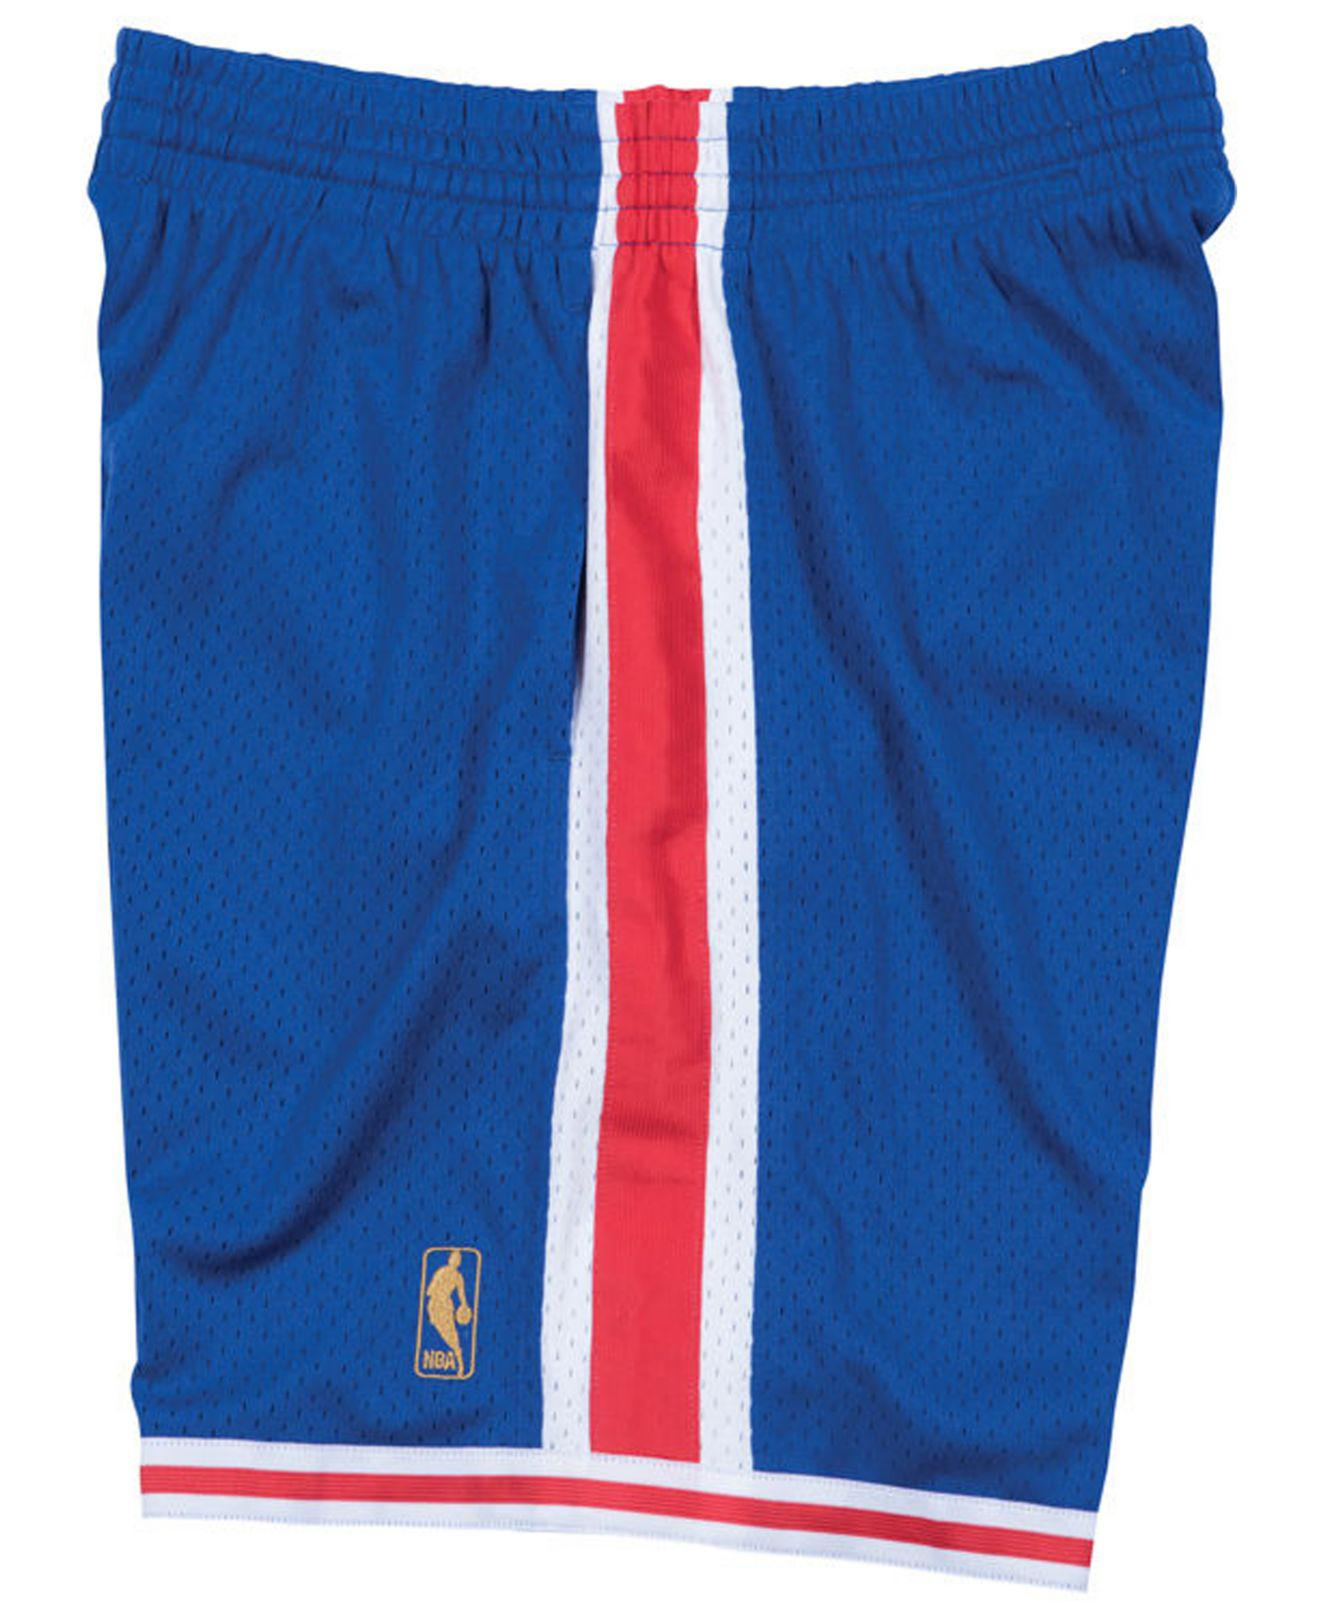 ffb26b1539d ... best price lyst mitchell ness philadelphia 76ers swingman shorts in blue  for men f7b6f e8a8f